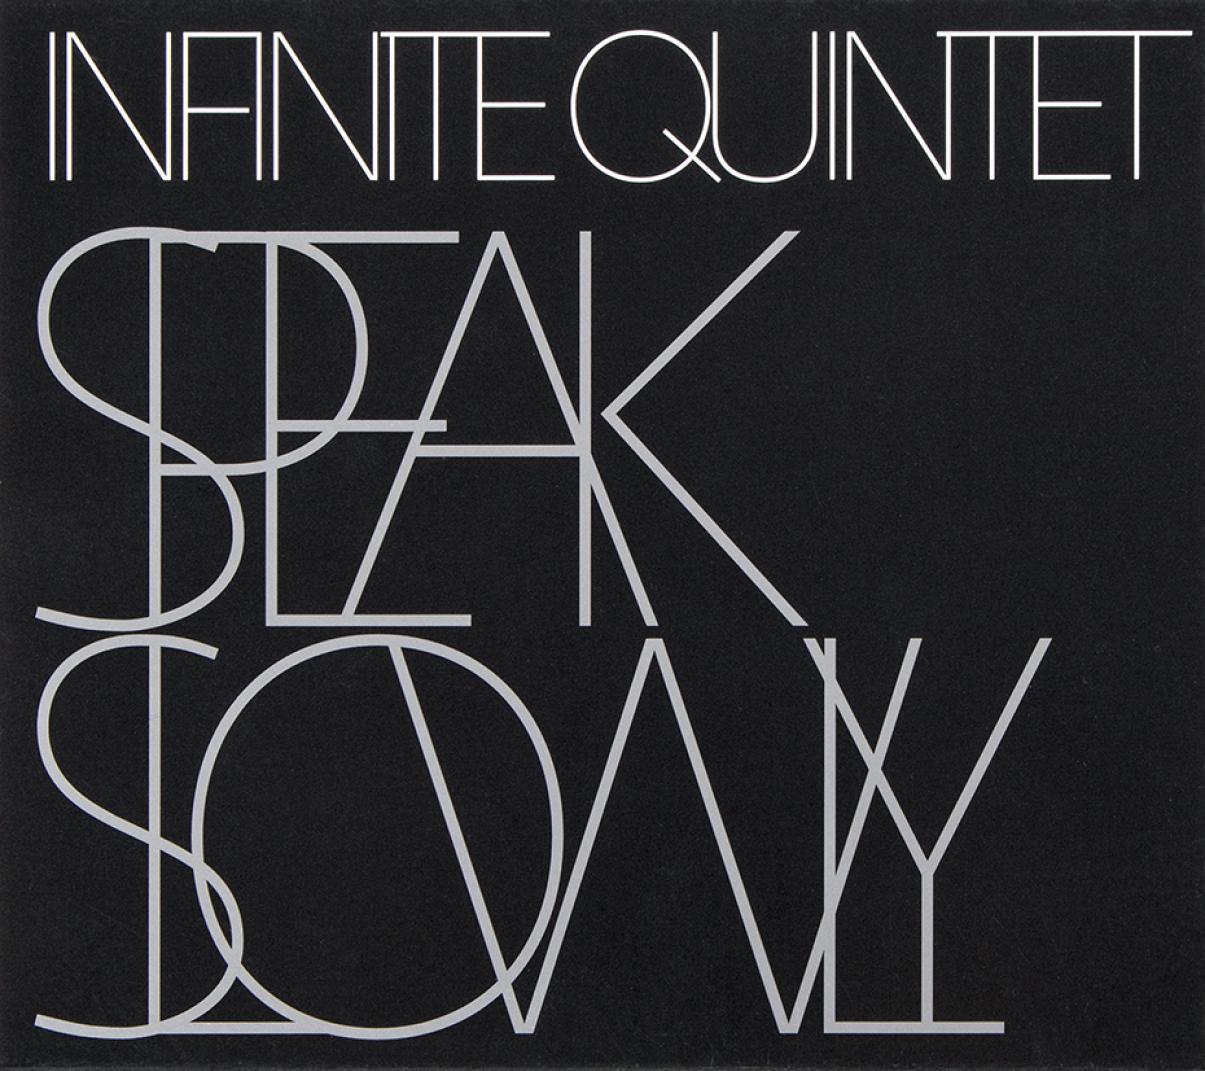 Infinite Quintet: Speak Slowly